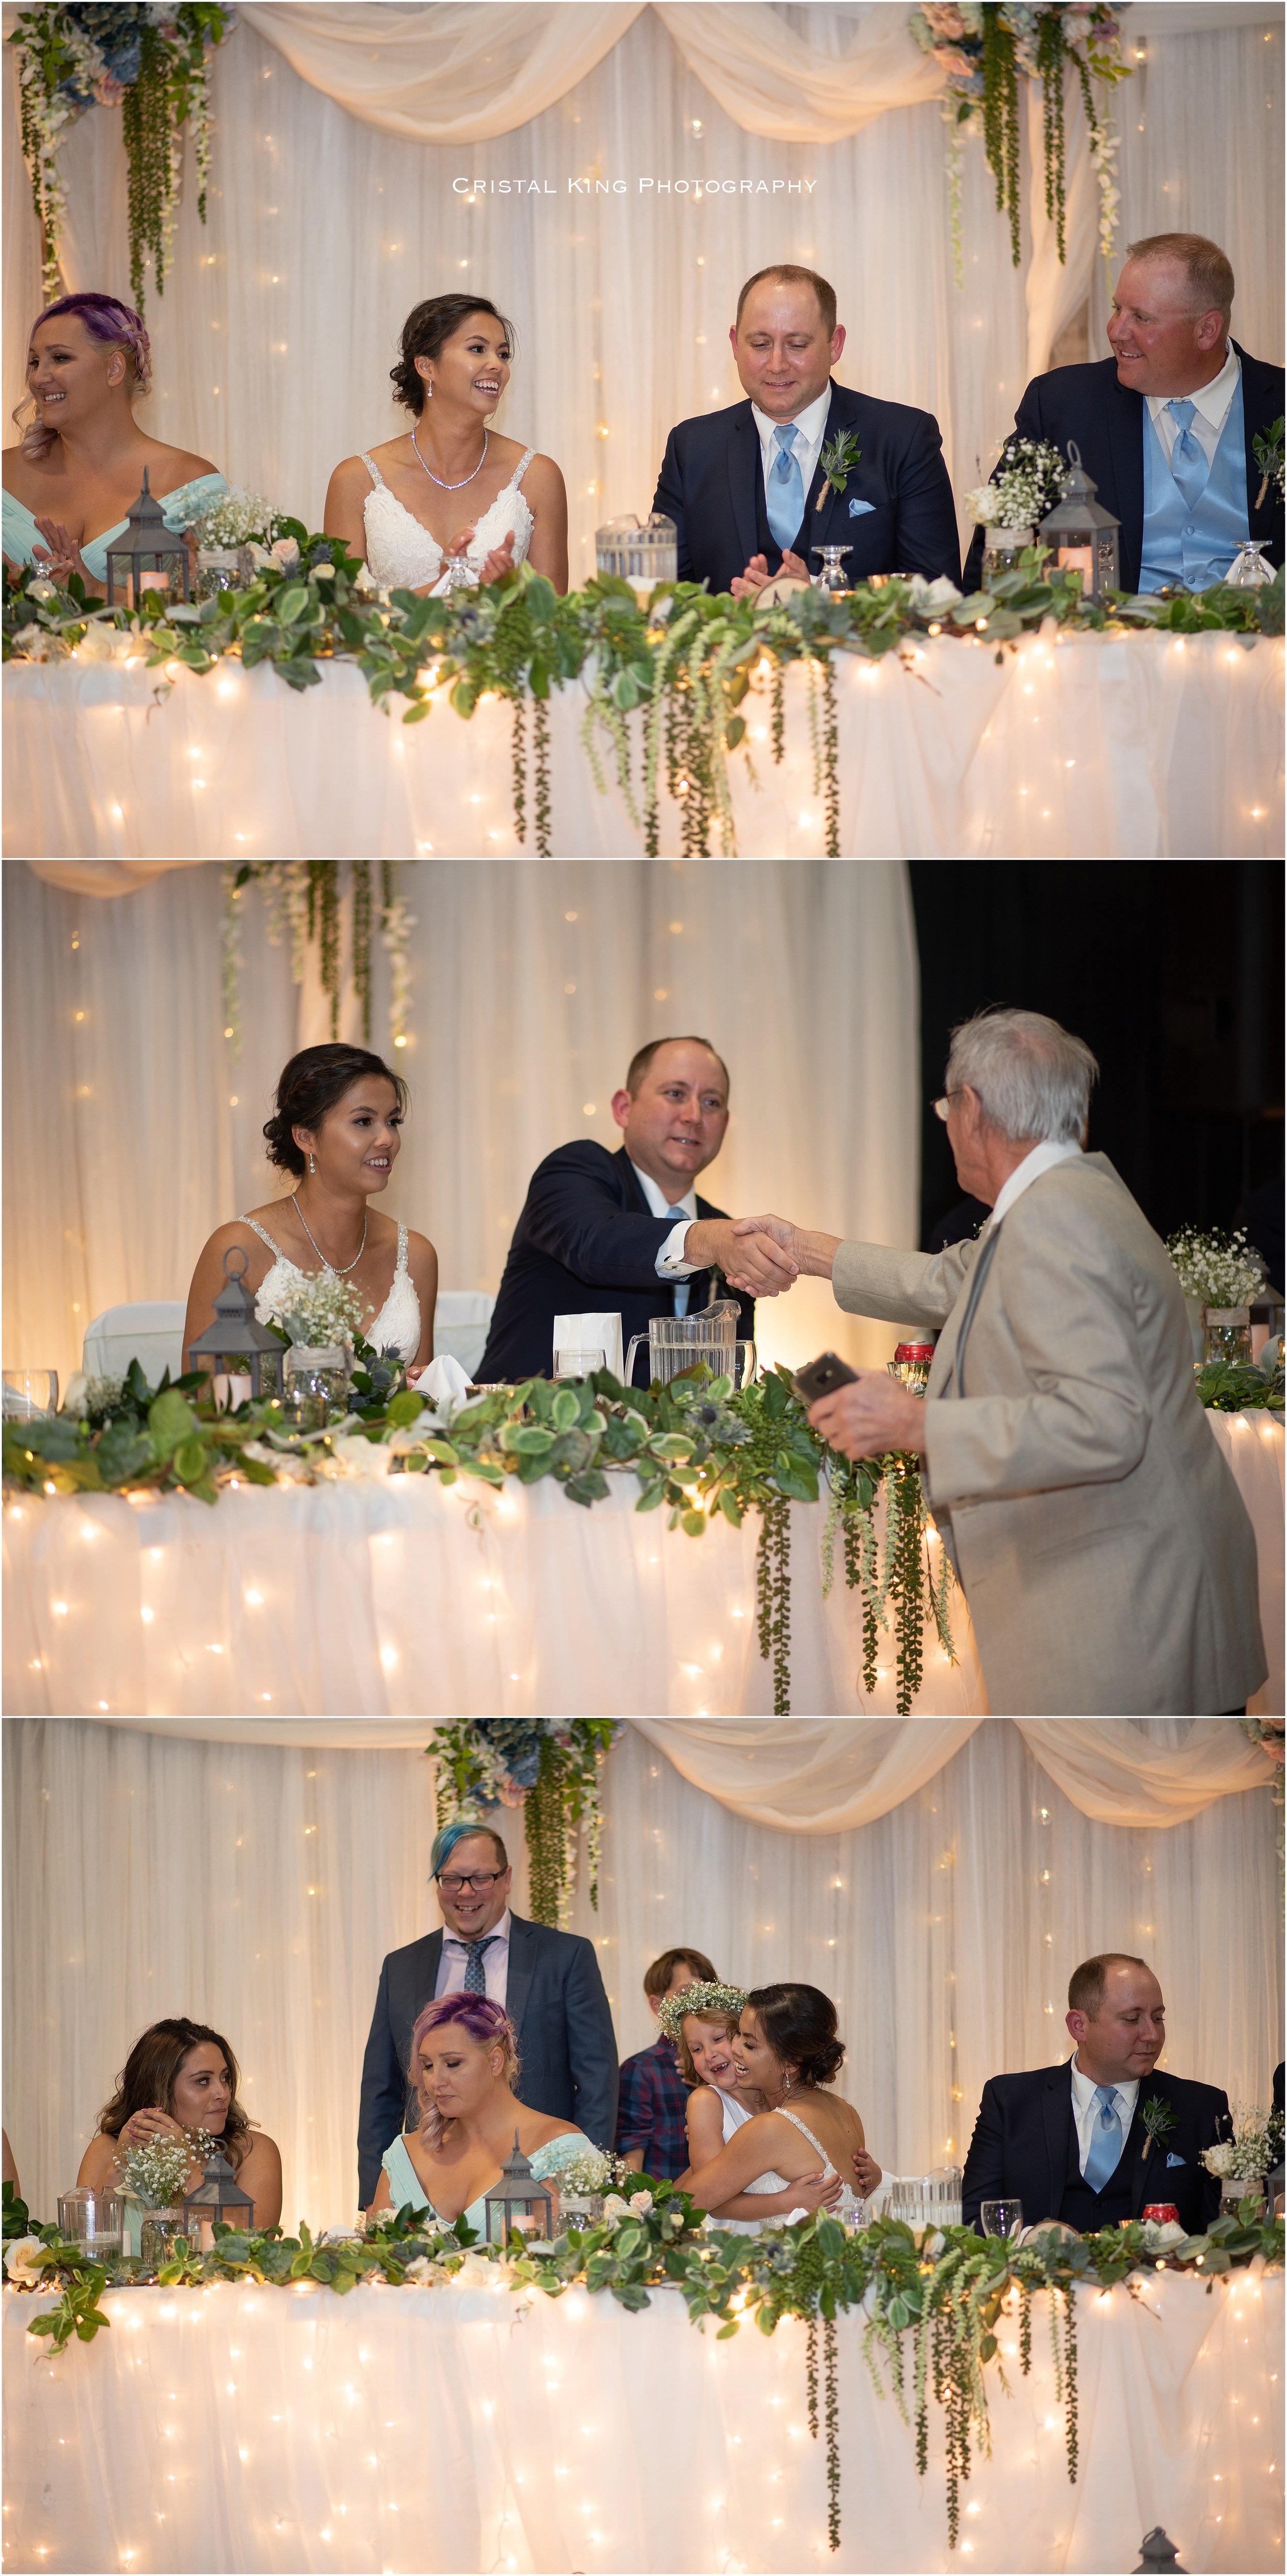 Quynh-Scotts-Wedding-111.jpg